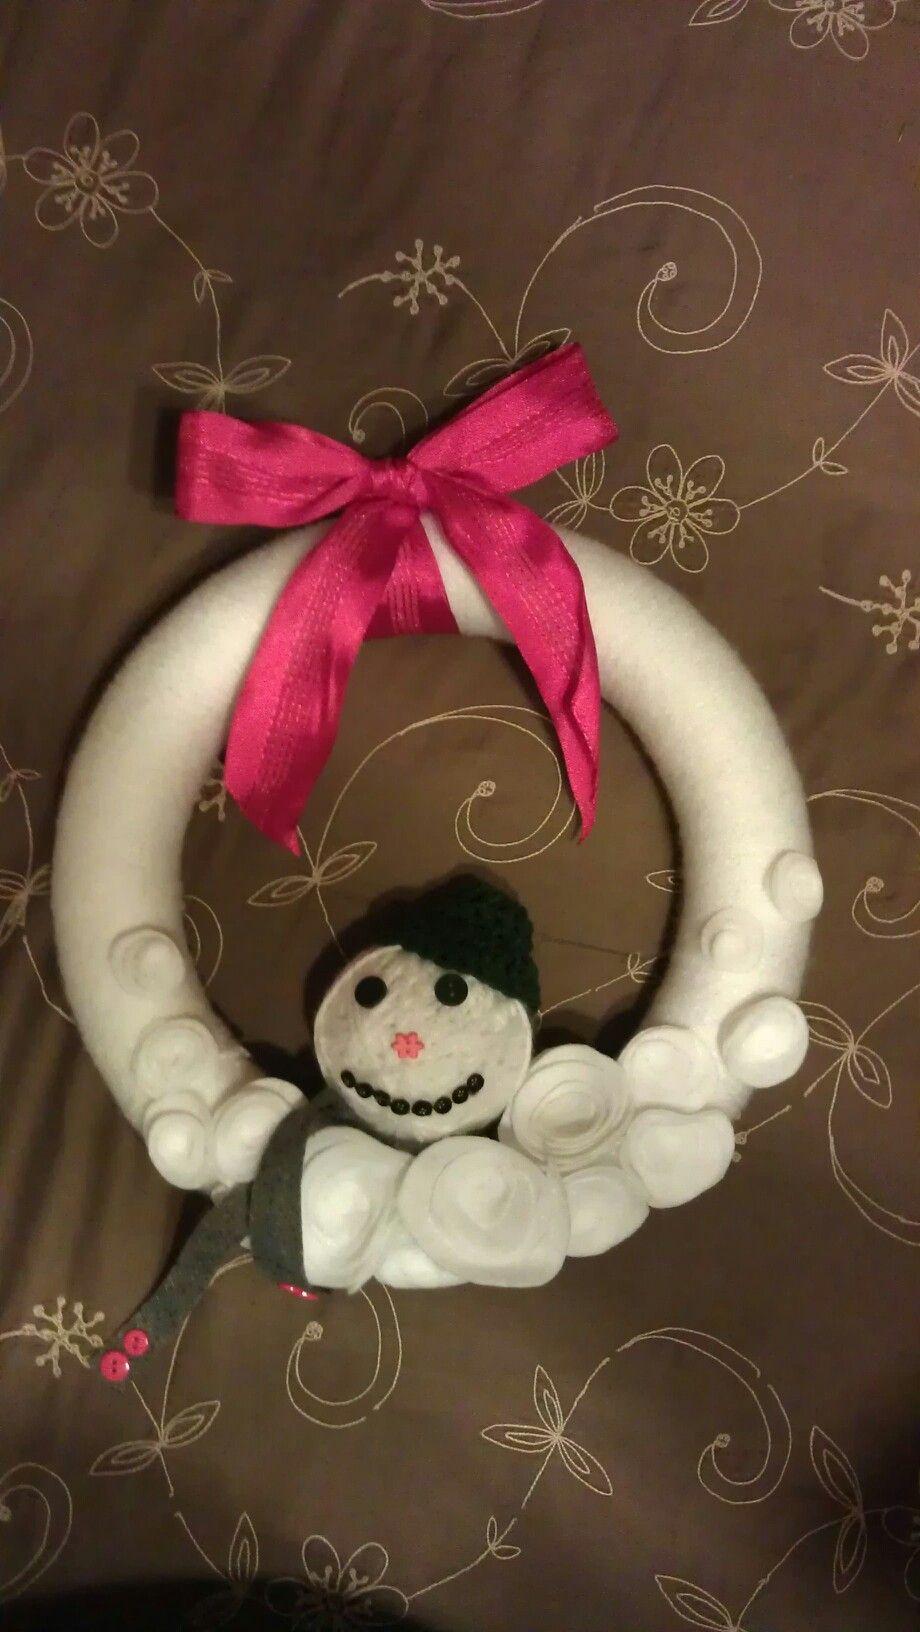 Melting snowman wreath